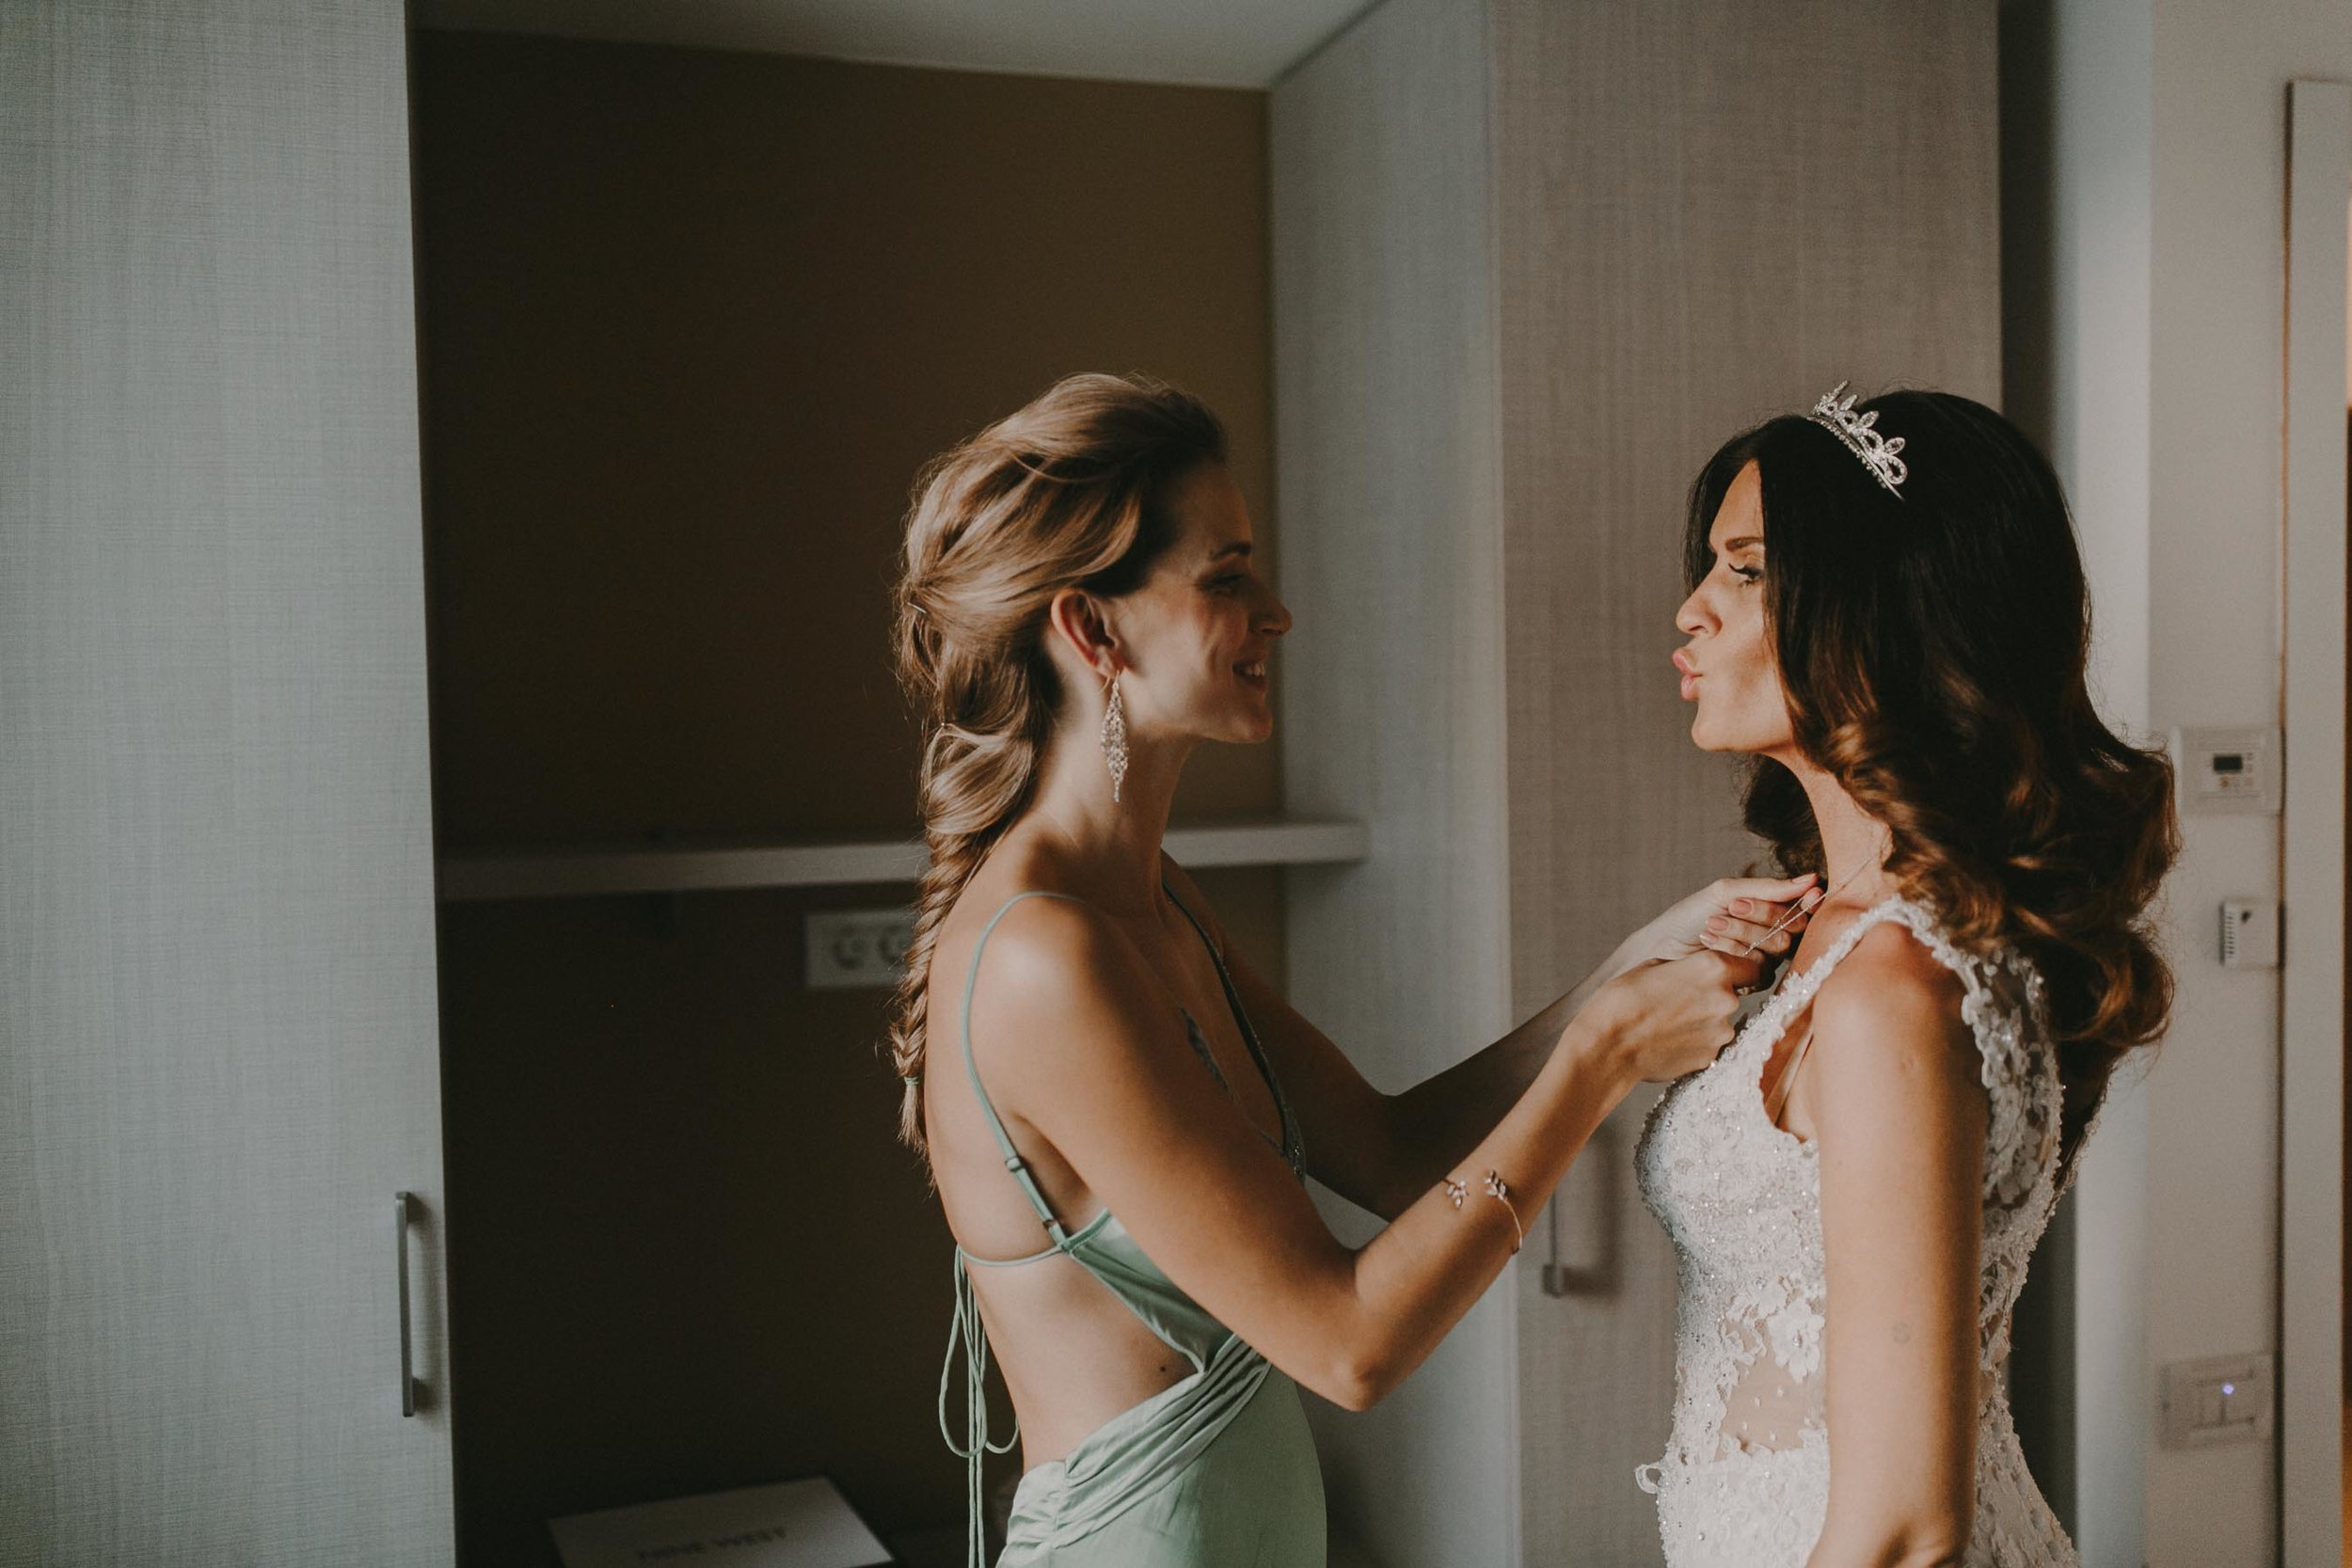 sylvia&dimitri-Wedding-Crvena_Luka-Croatia-34(7605).jpg